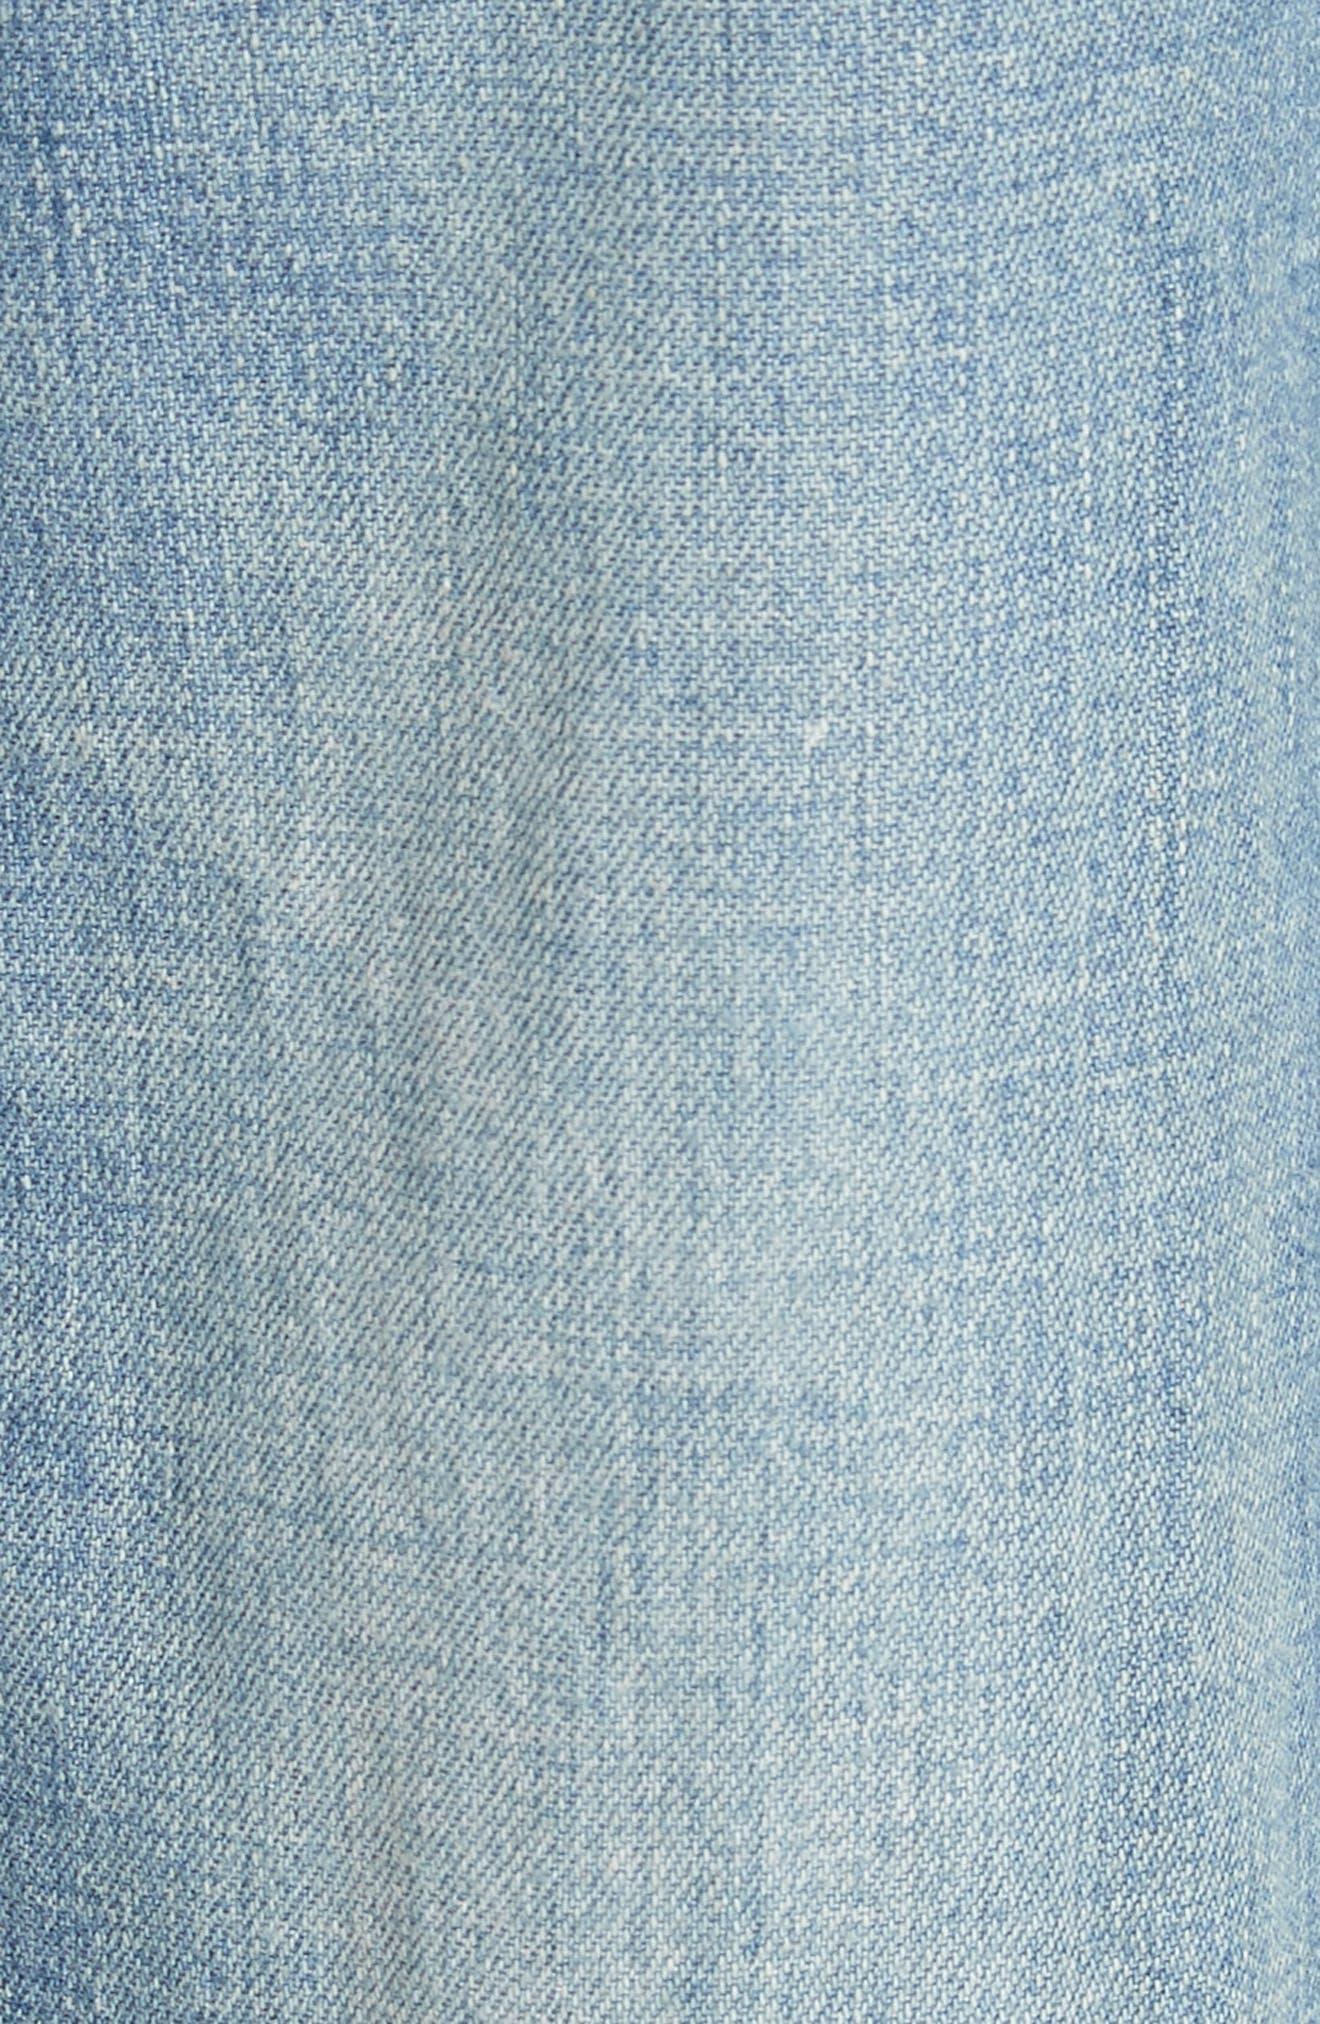 Drapey Denim Wide Leg Pants,                             Alternate thumbnail 5, color,                             434